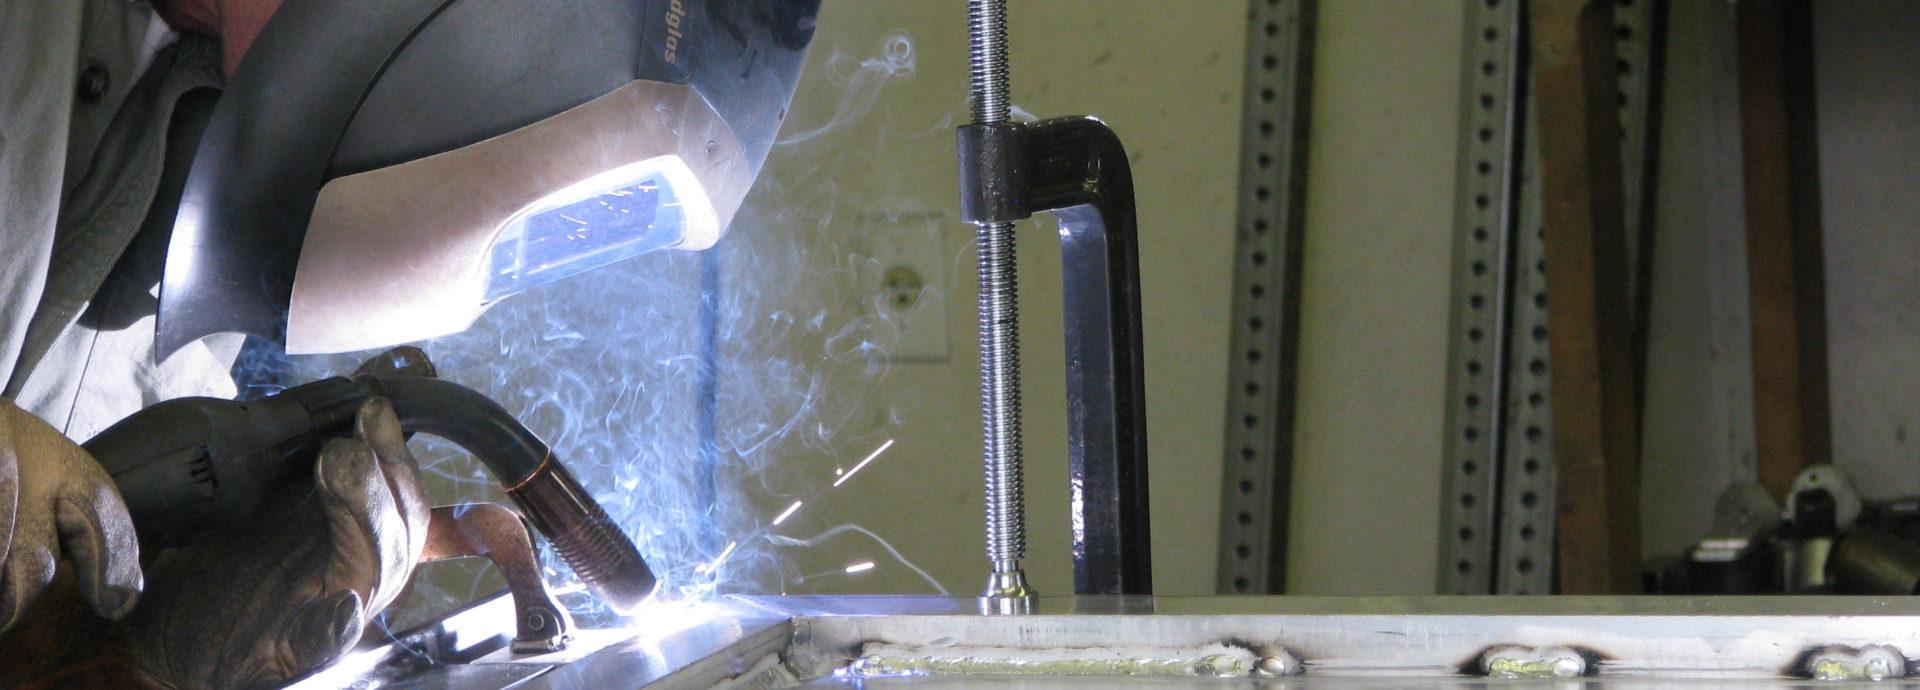 Metal 2 Sculpture Welding & Fabrication